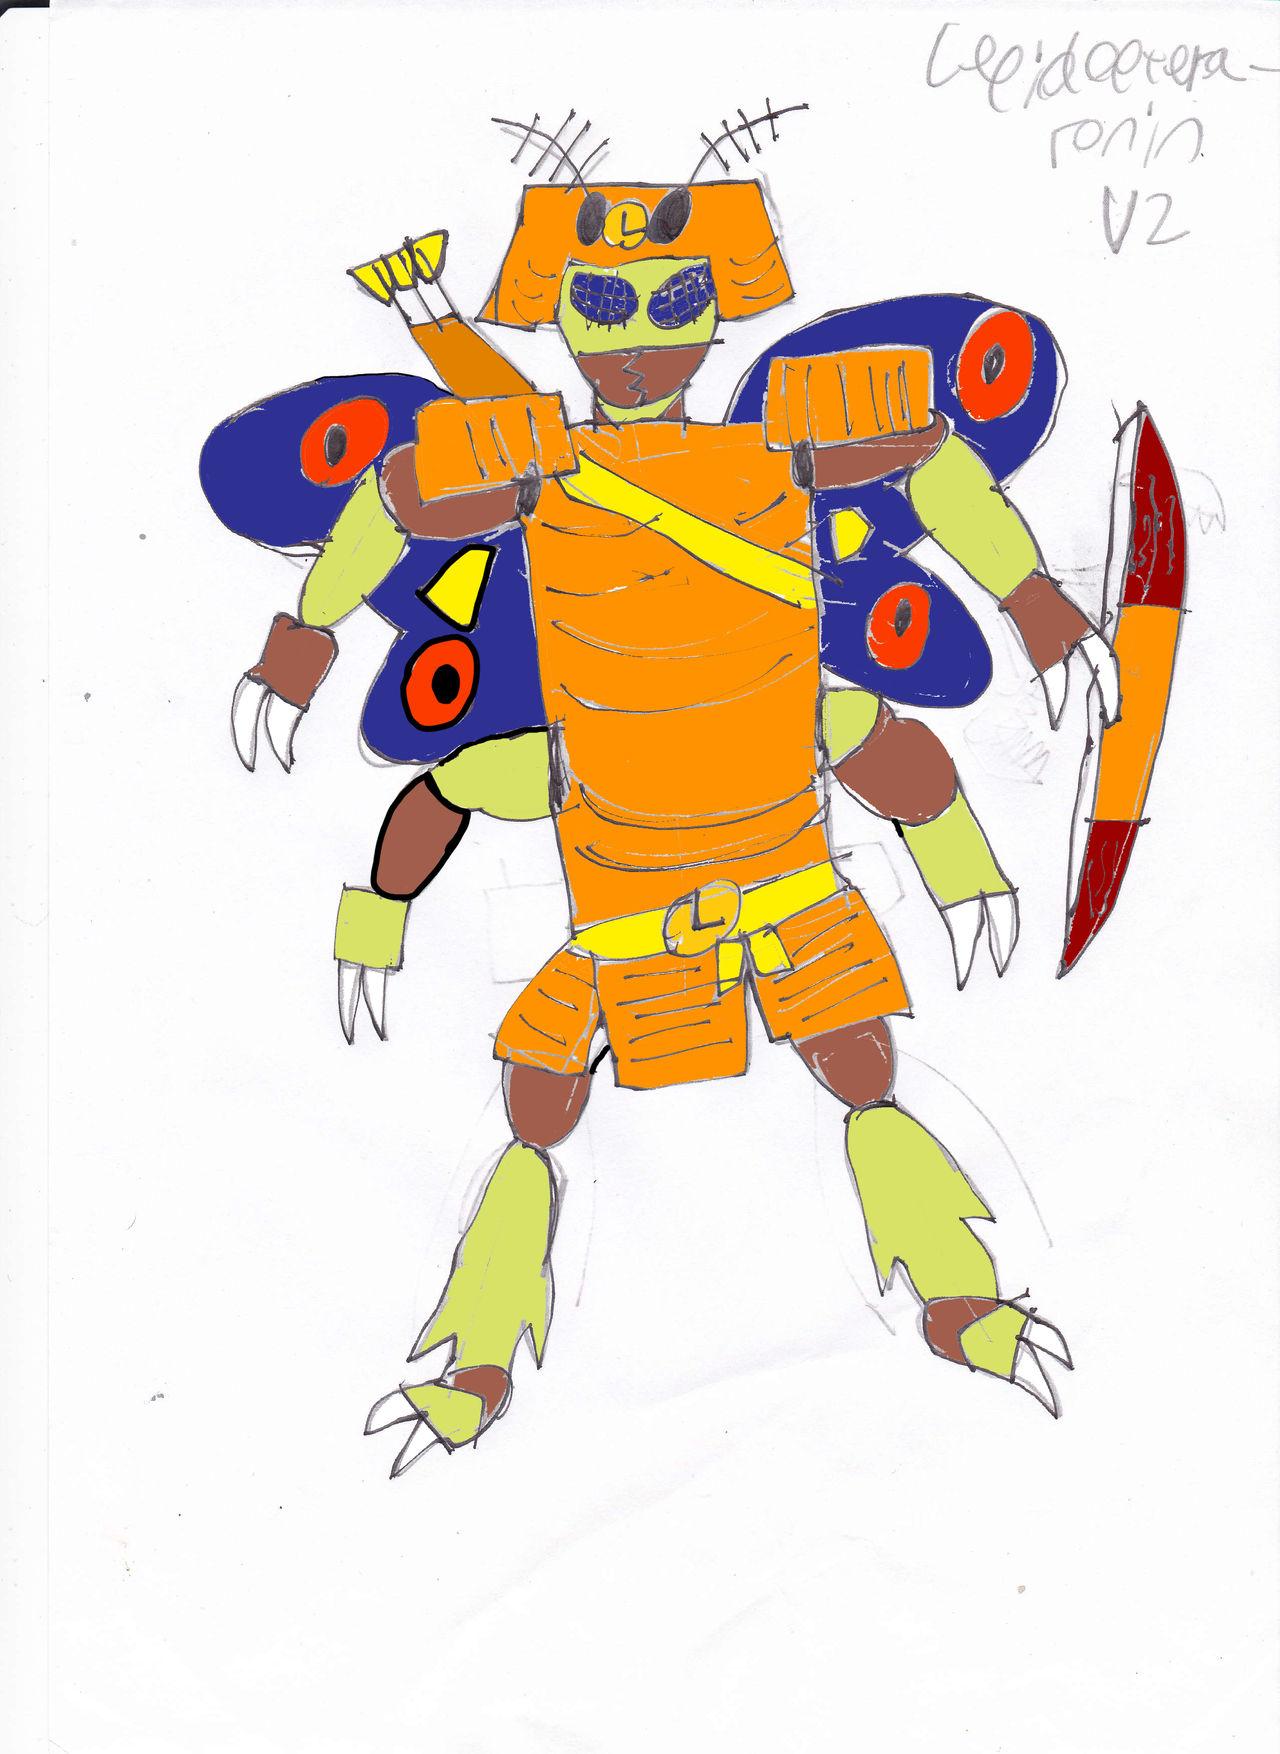 Lepidoptera-ronin